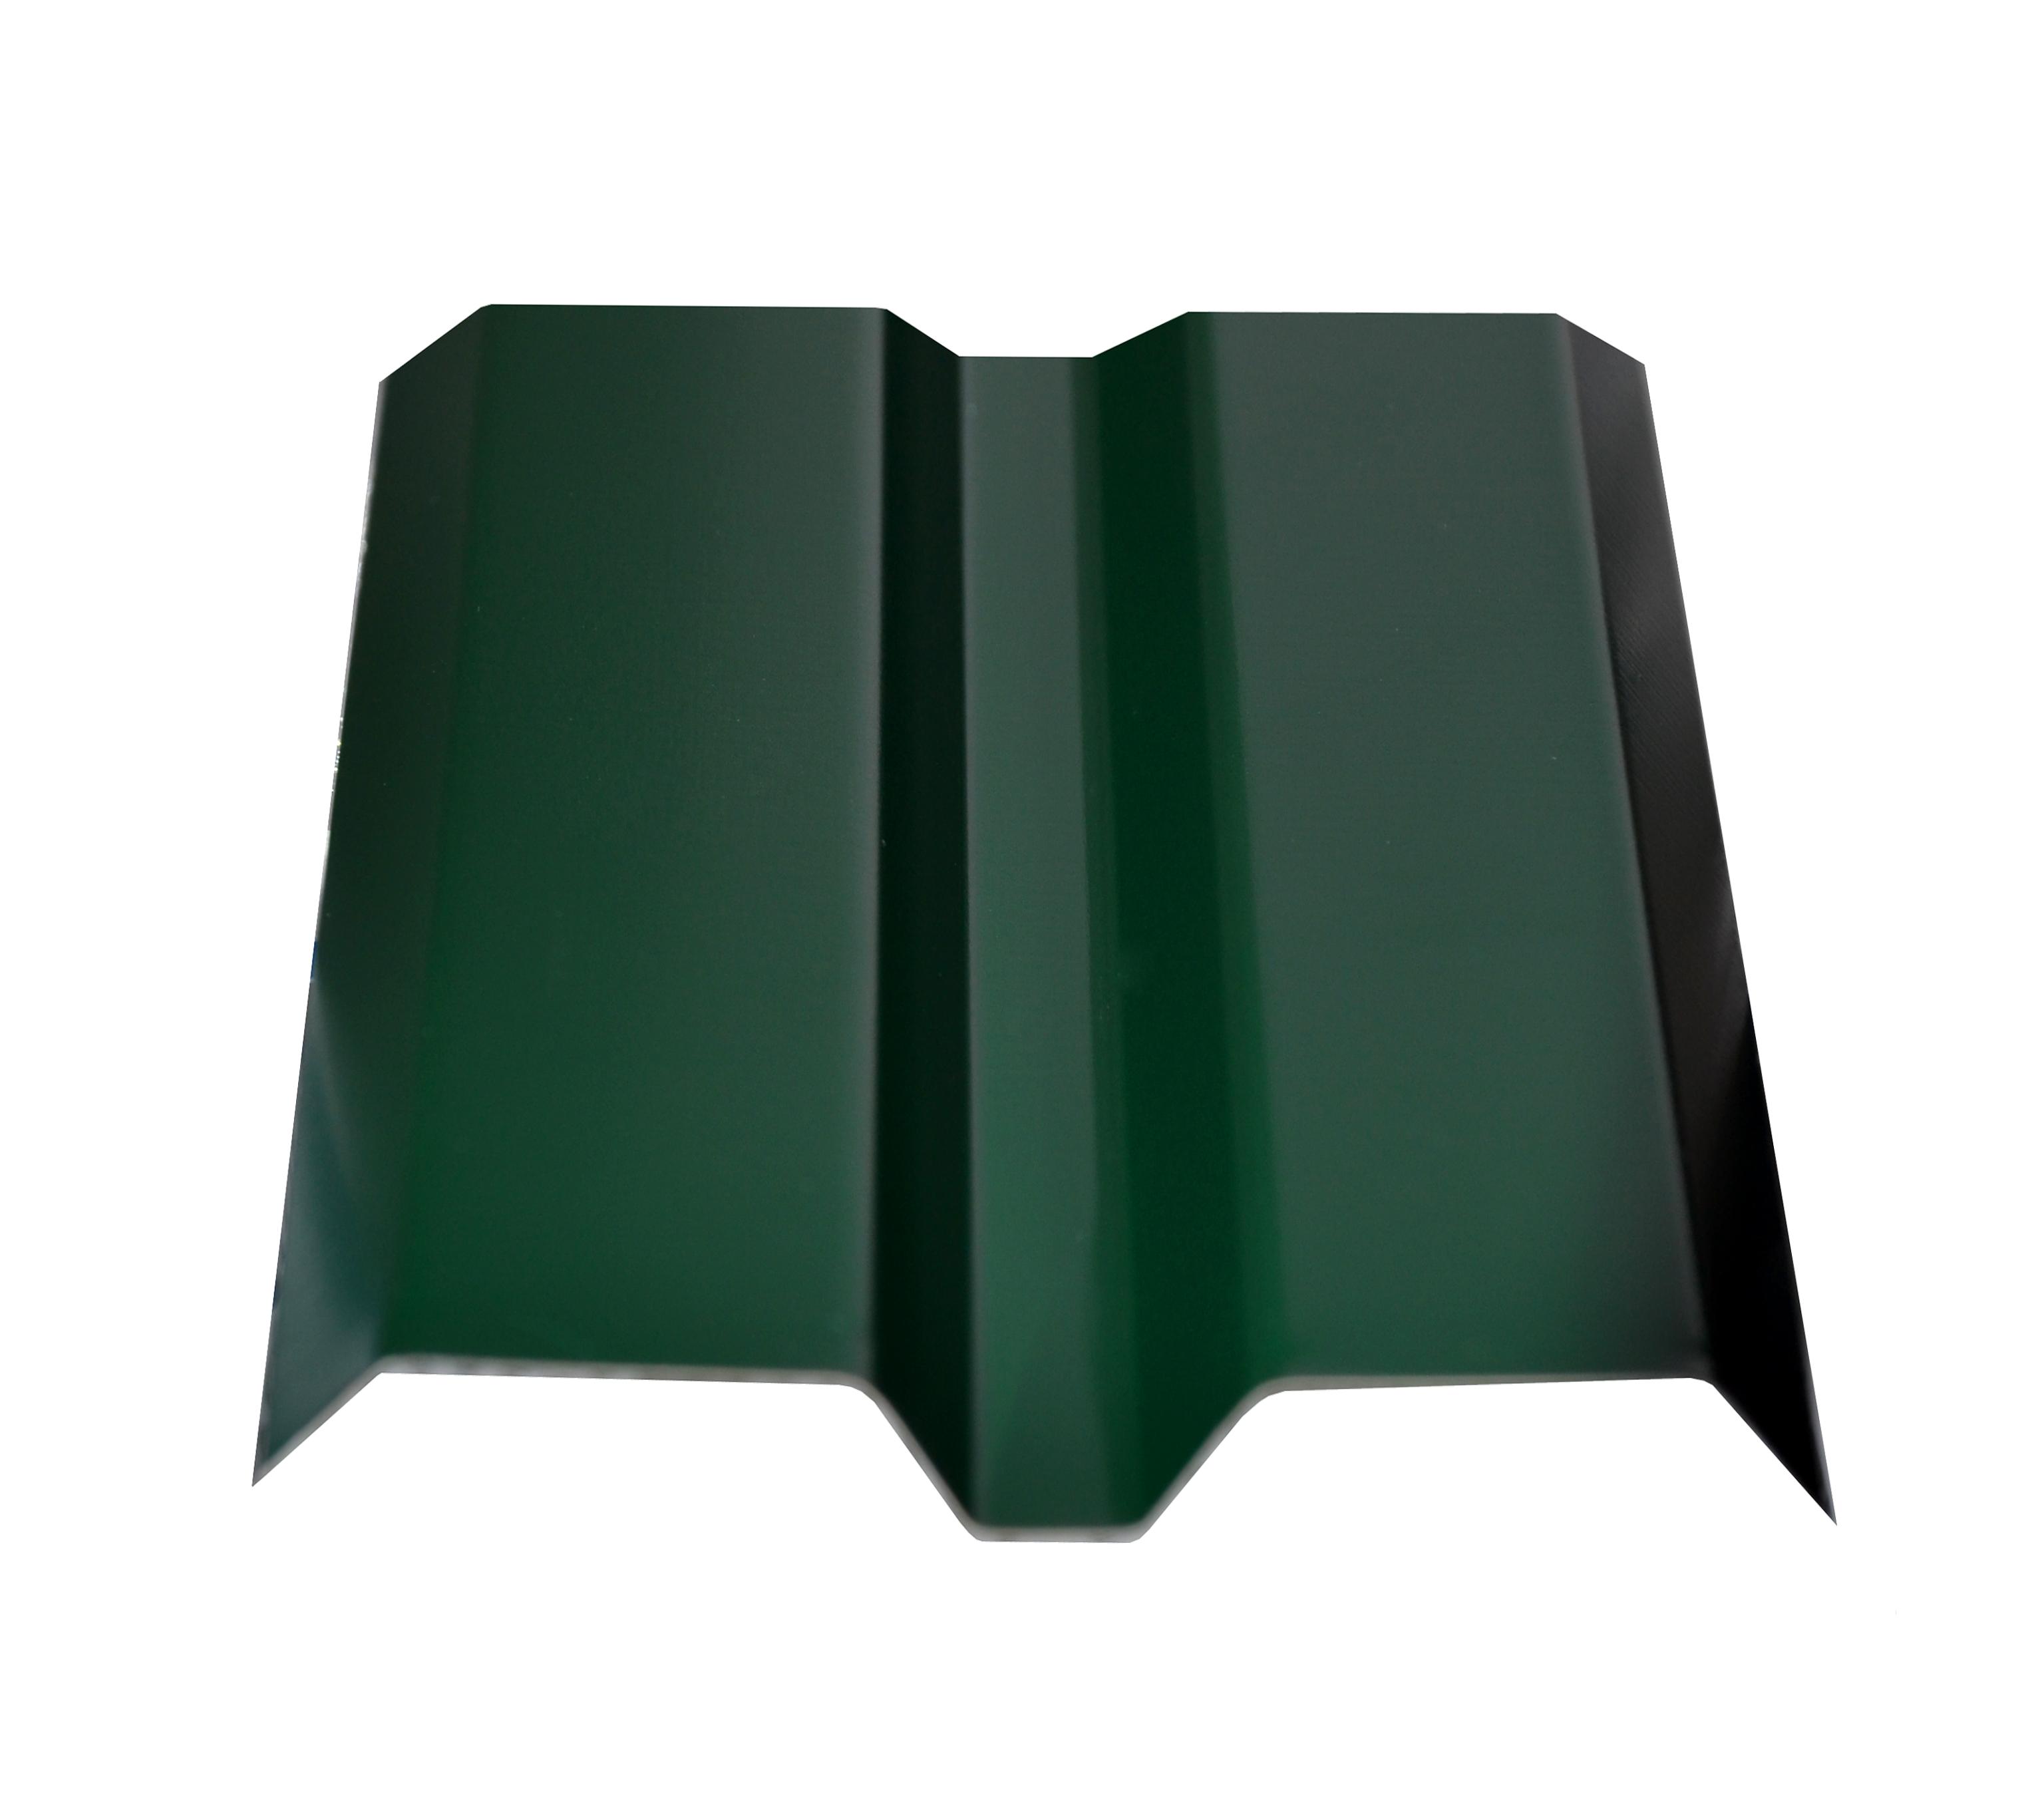 Евроштакетник  87х1800мм, толщина 0,4 мм зеленый